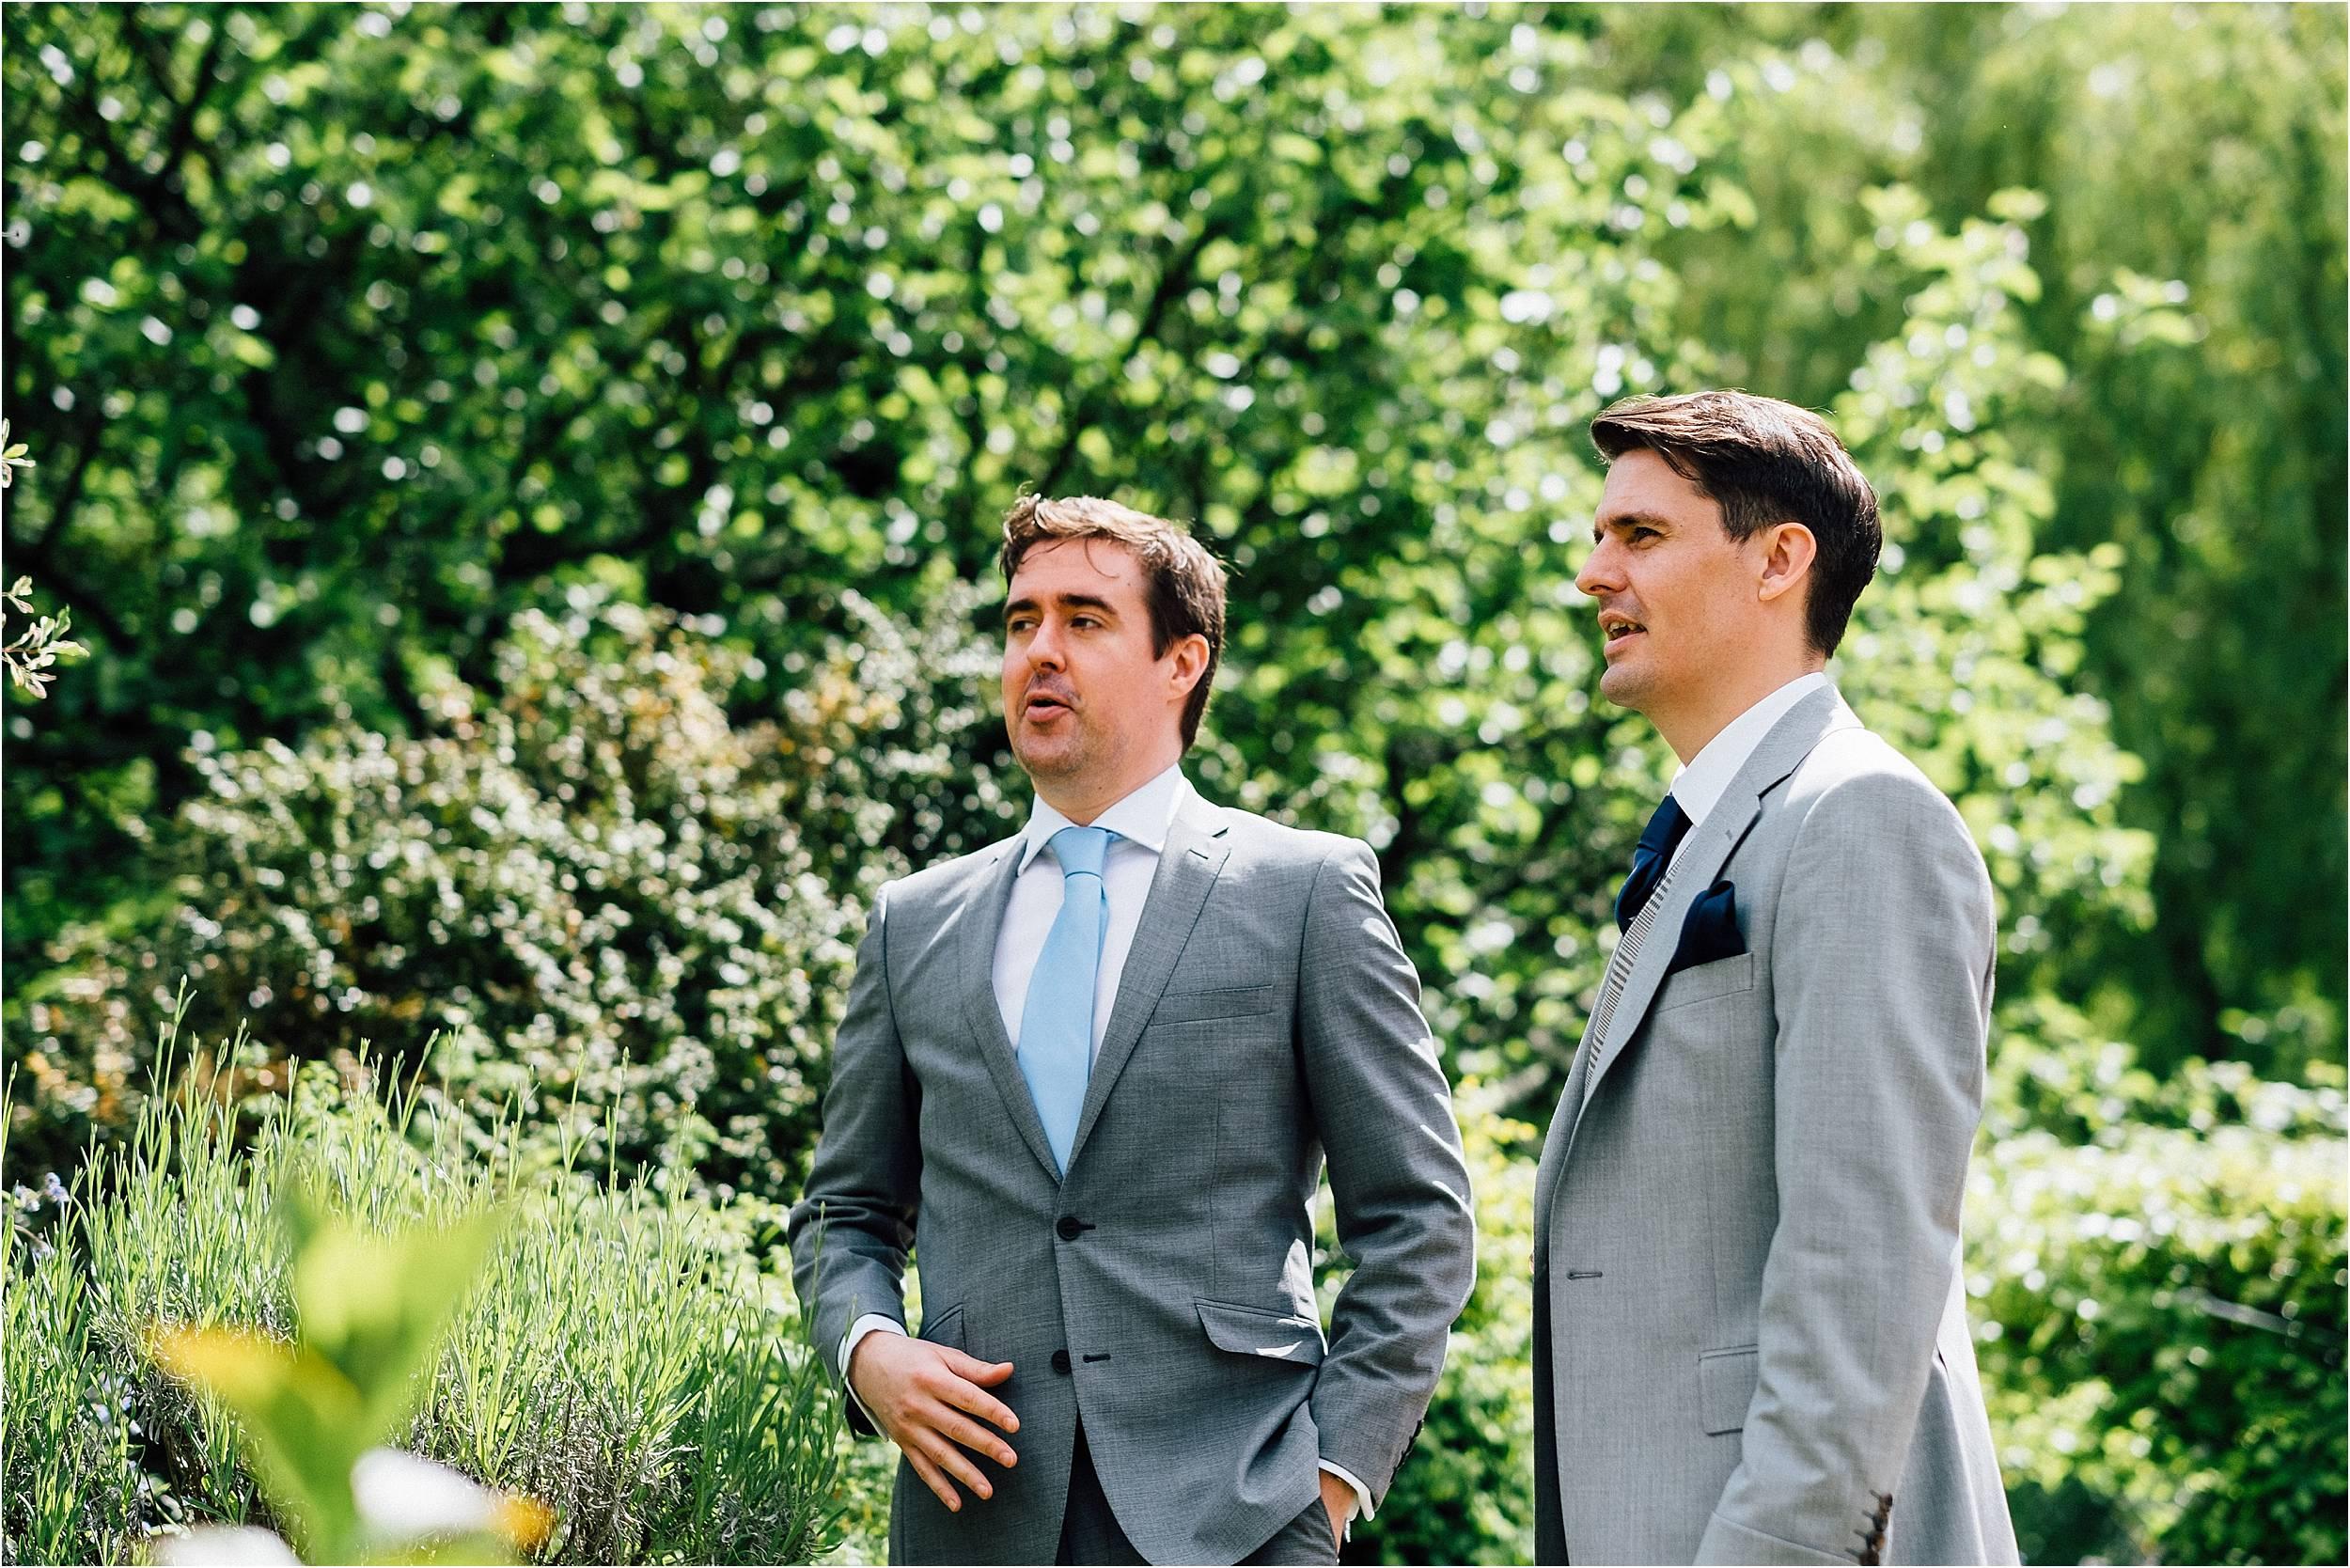 Surrey Hookhouse Farm Wedding Photographer_0026.jpg